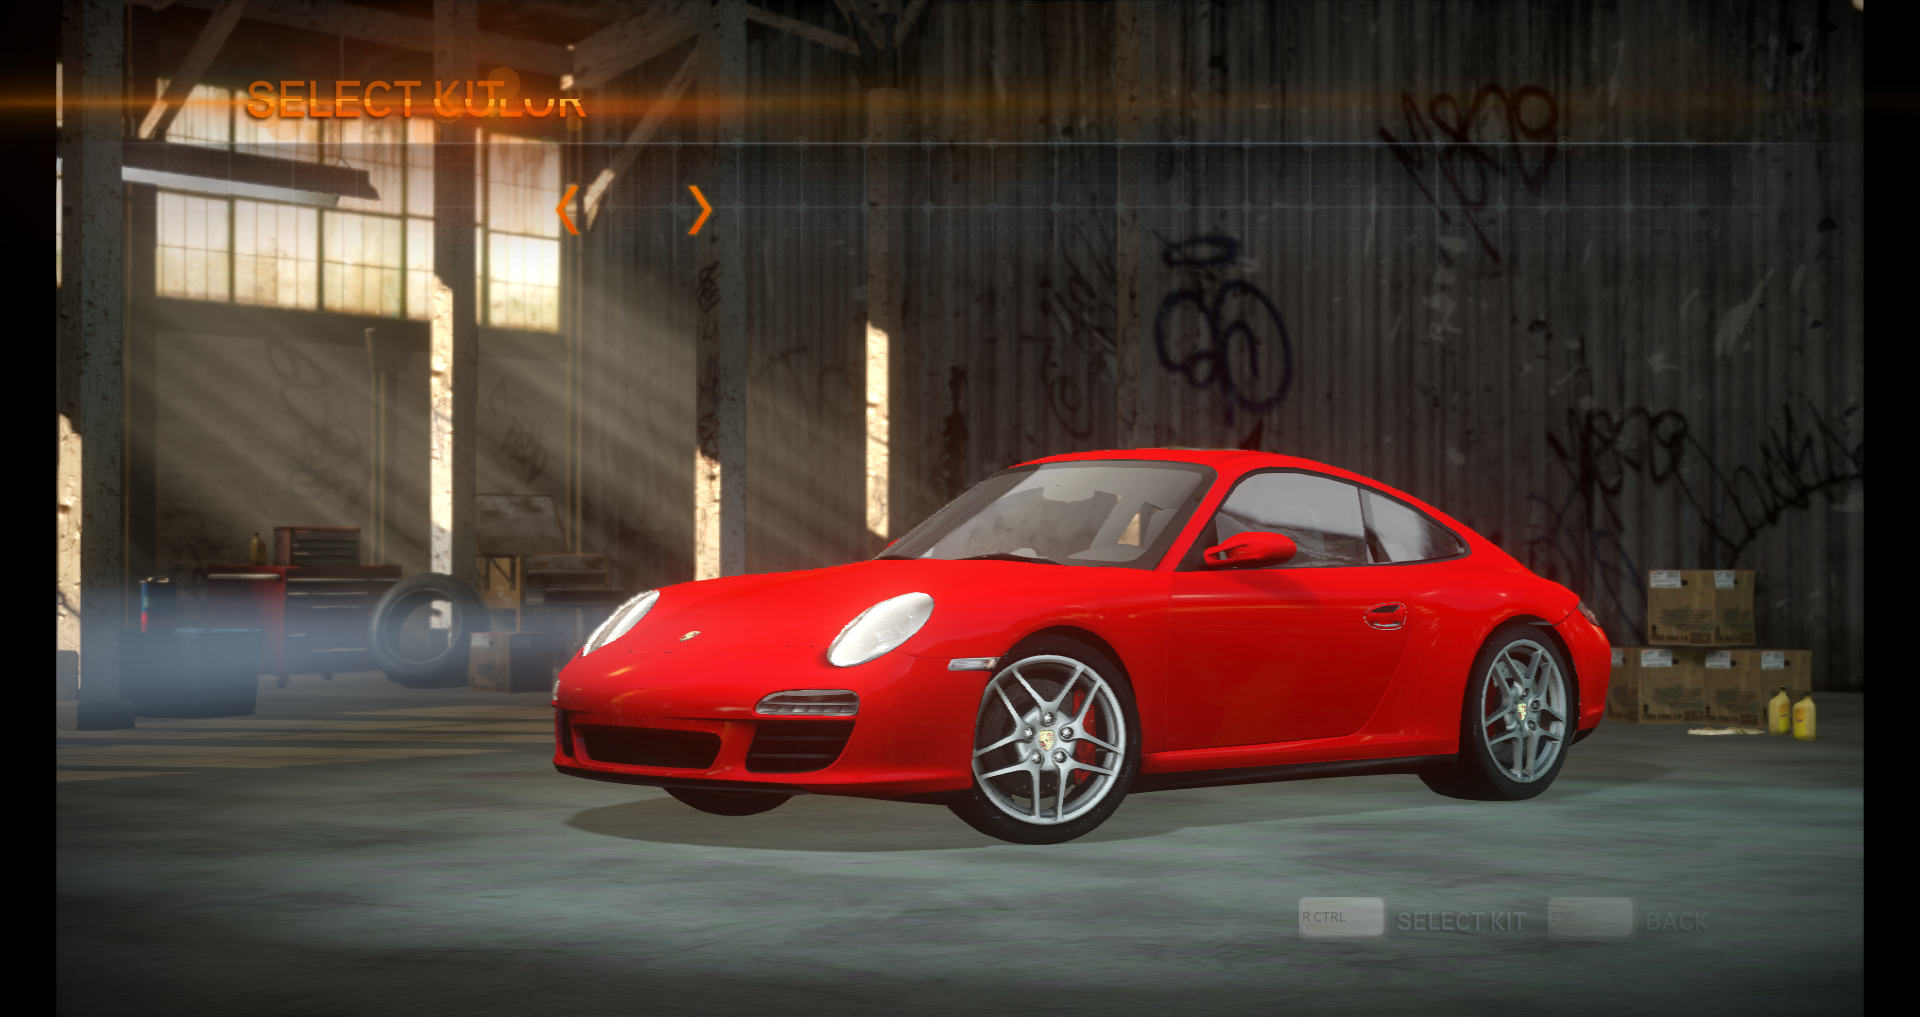 Porsche 911 Carrera 4S (997.2)